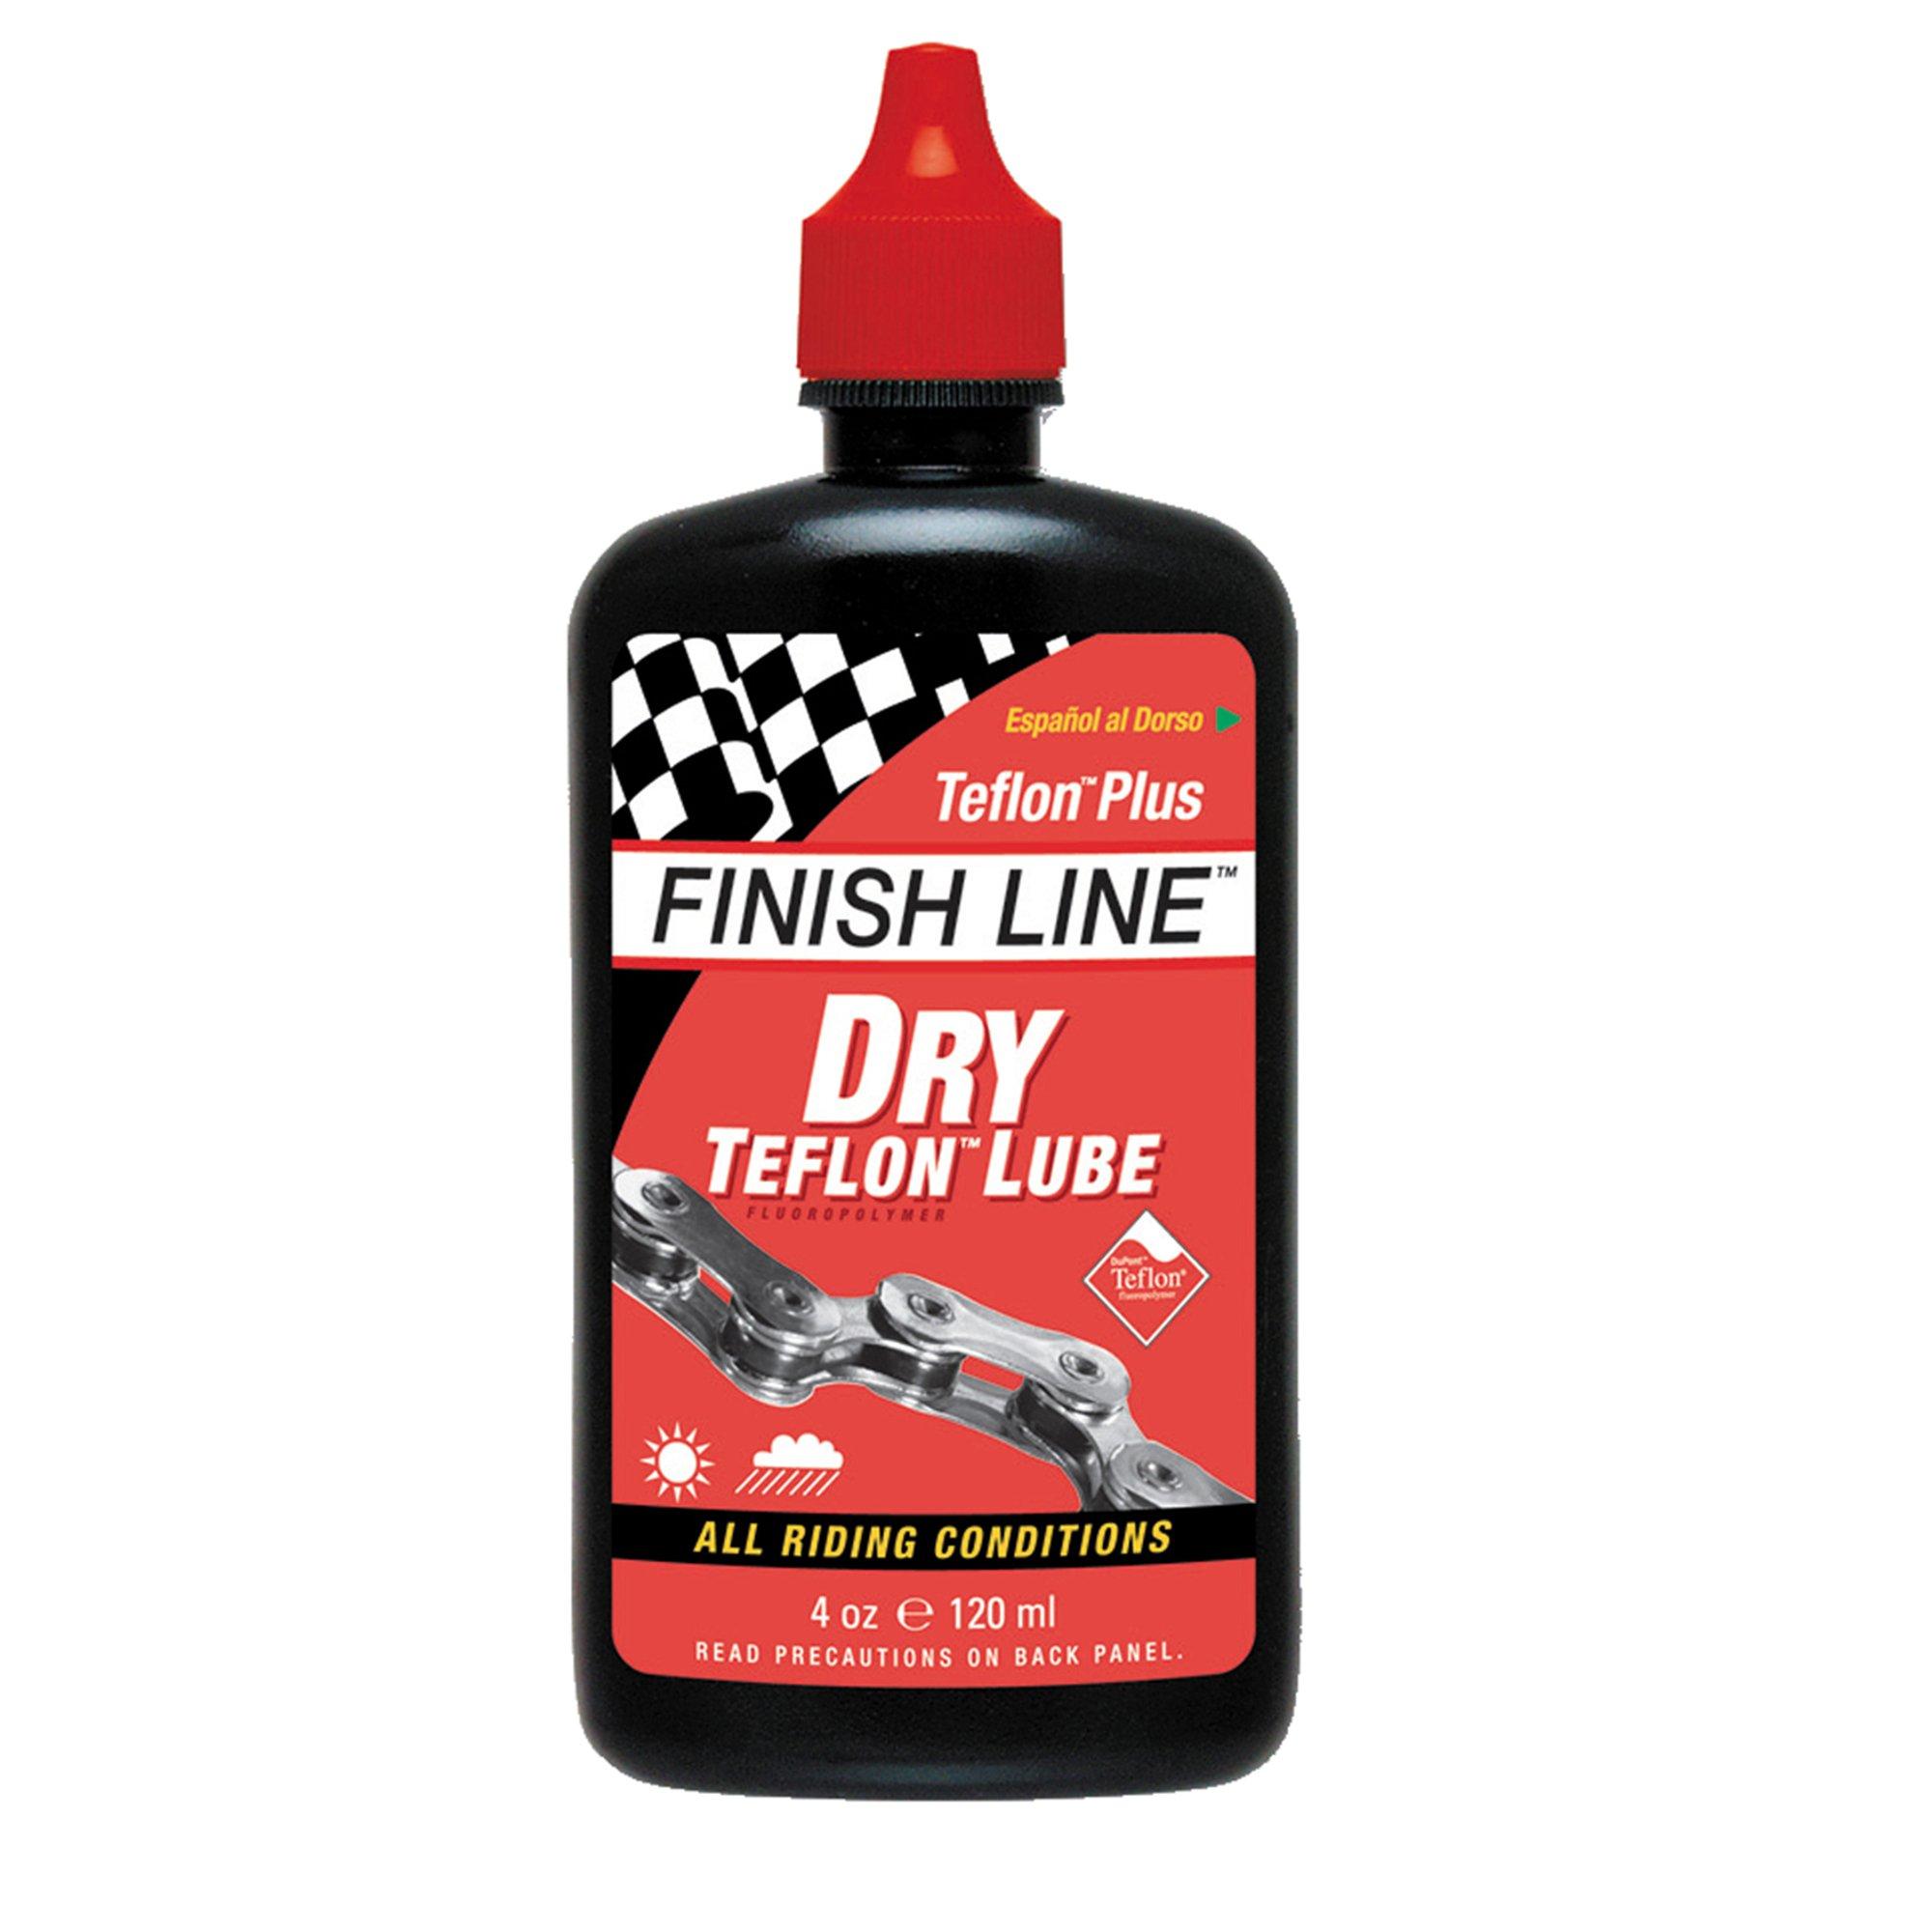 Finish Line Teflon Dry Lube 4oz Drip by Finish Line